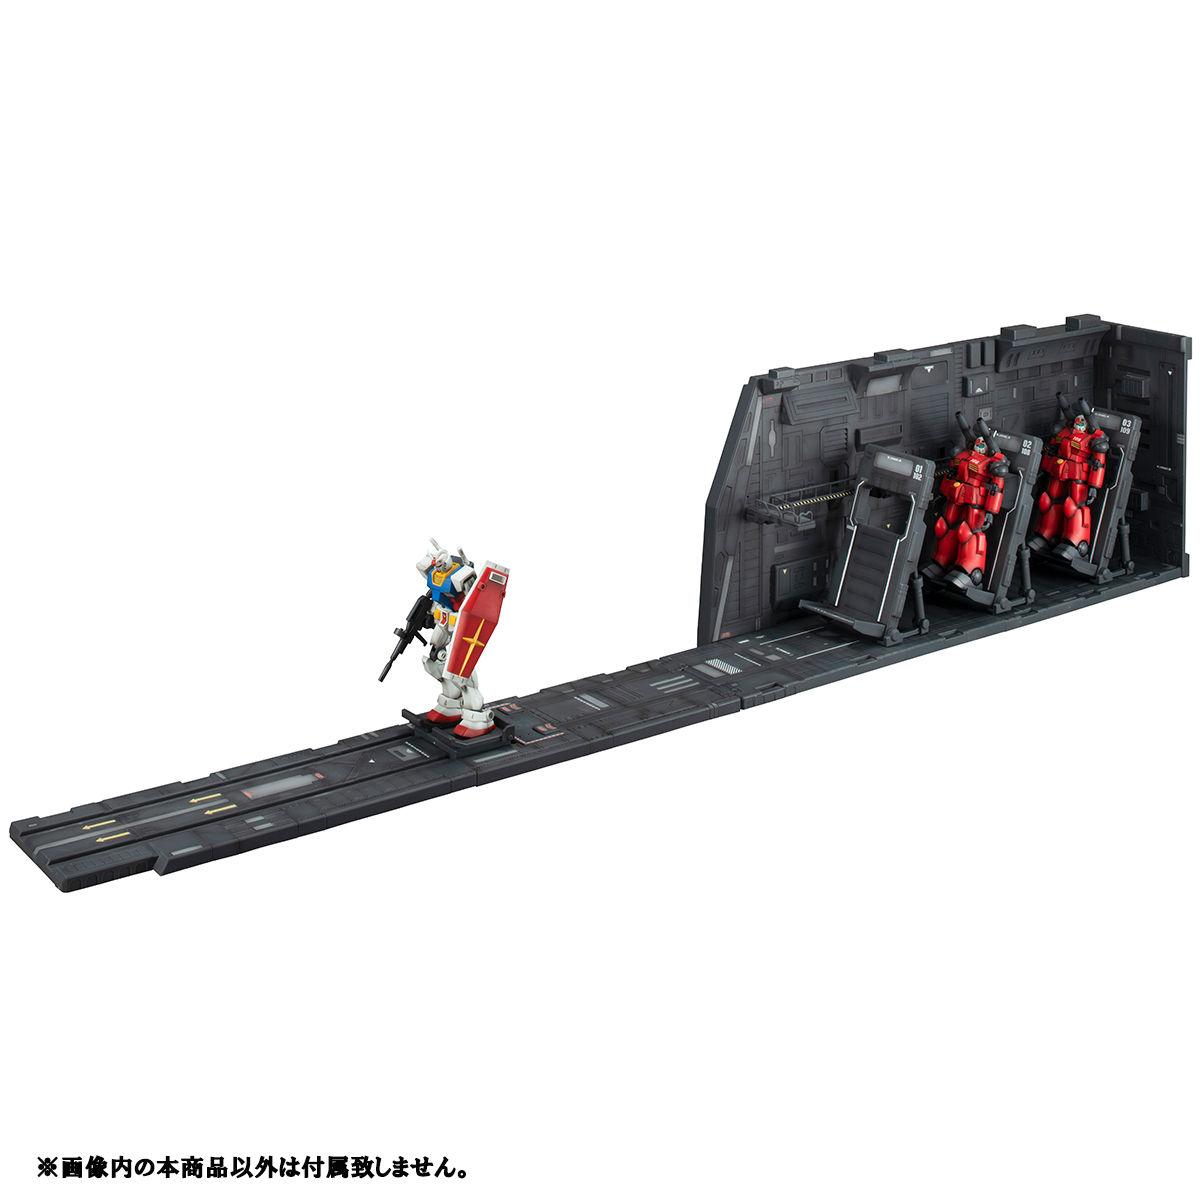 P-Bandai Realistic Model Series 1/144 WHITE BASE CATAPULT DECK RENEWAL EDITION